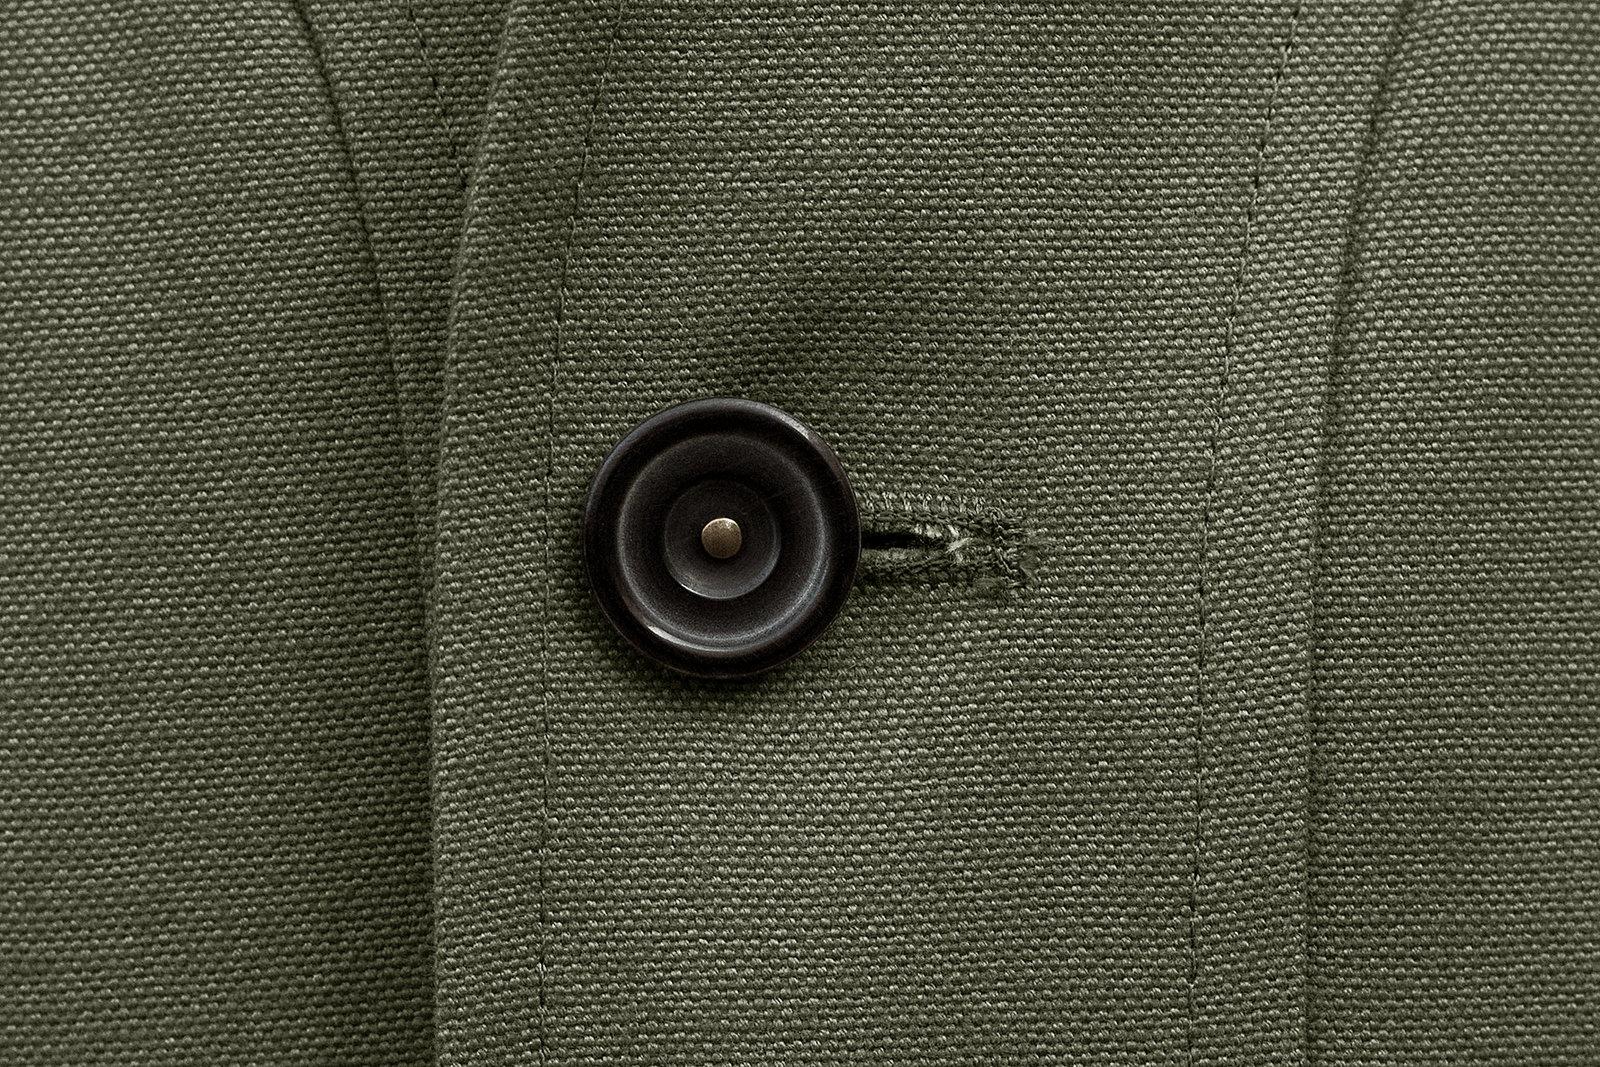 engineer-jacket-cotton-canvas-green-3@2x.jpg